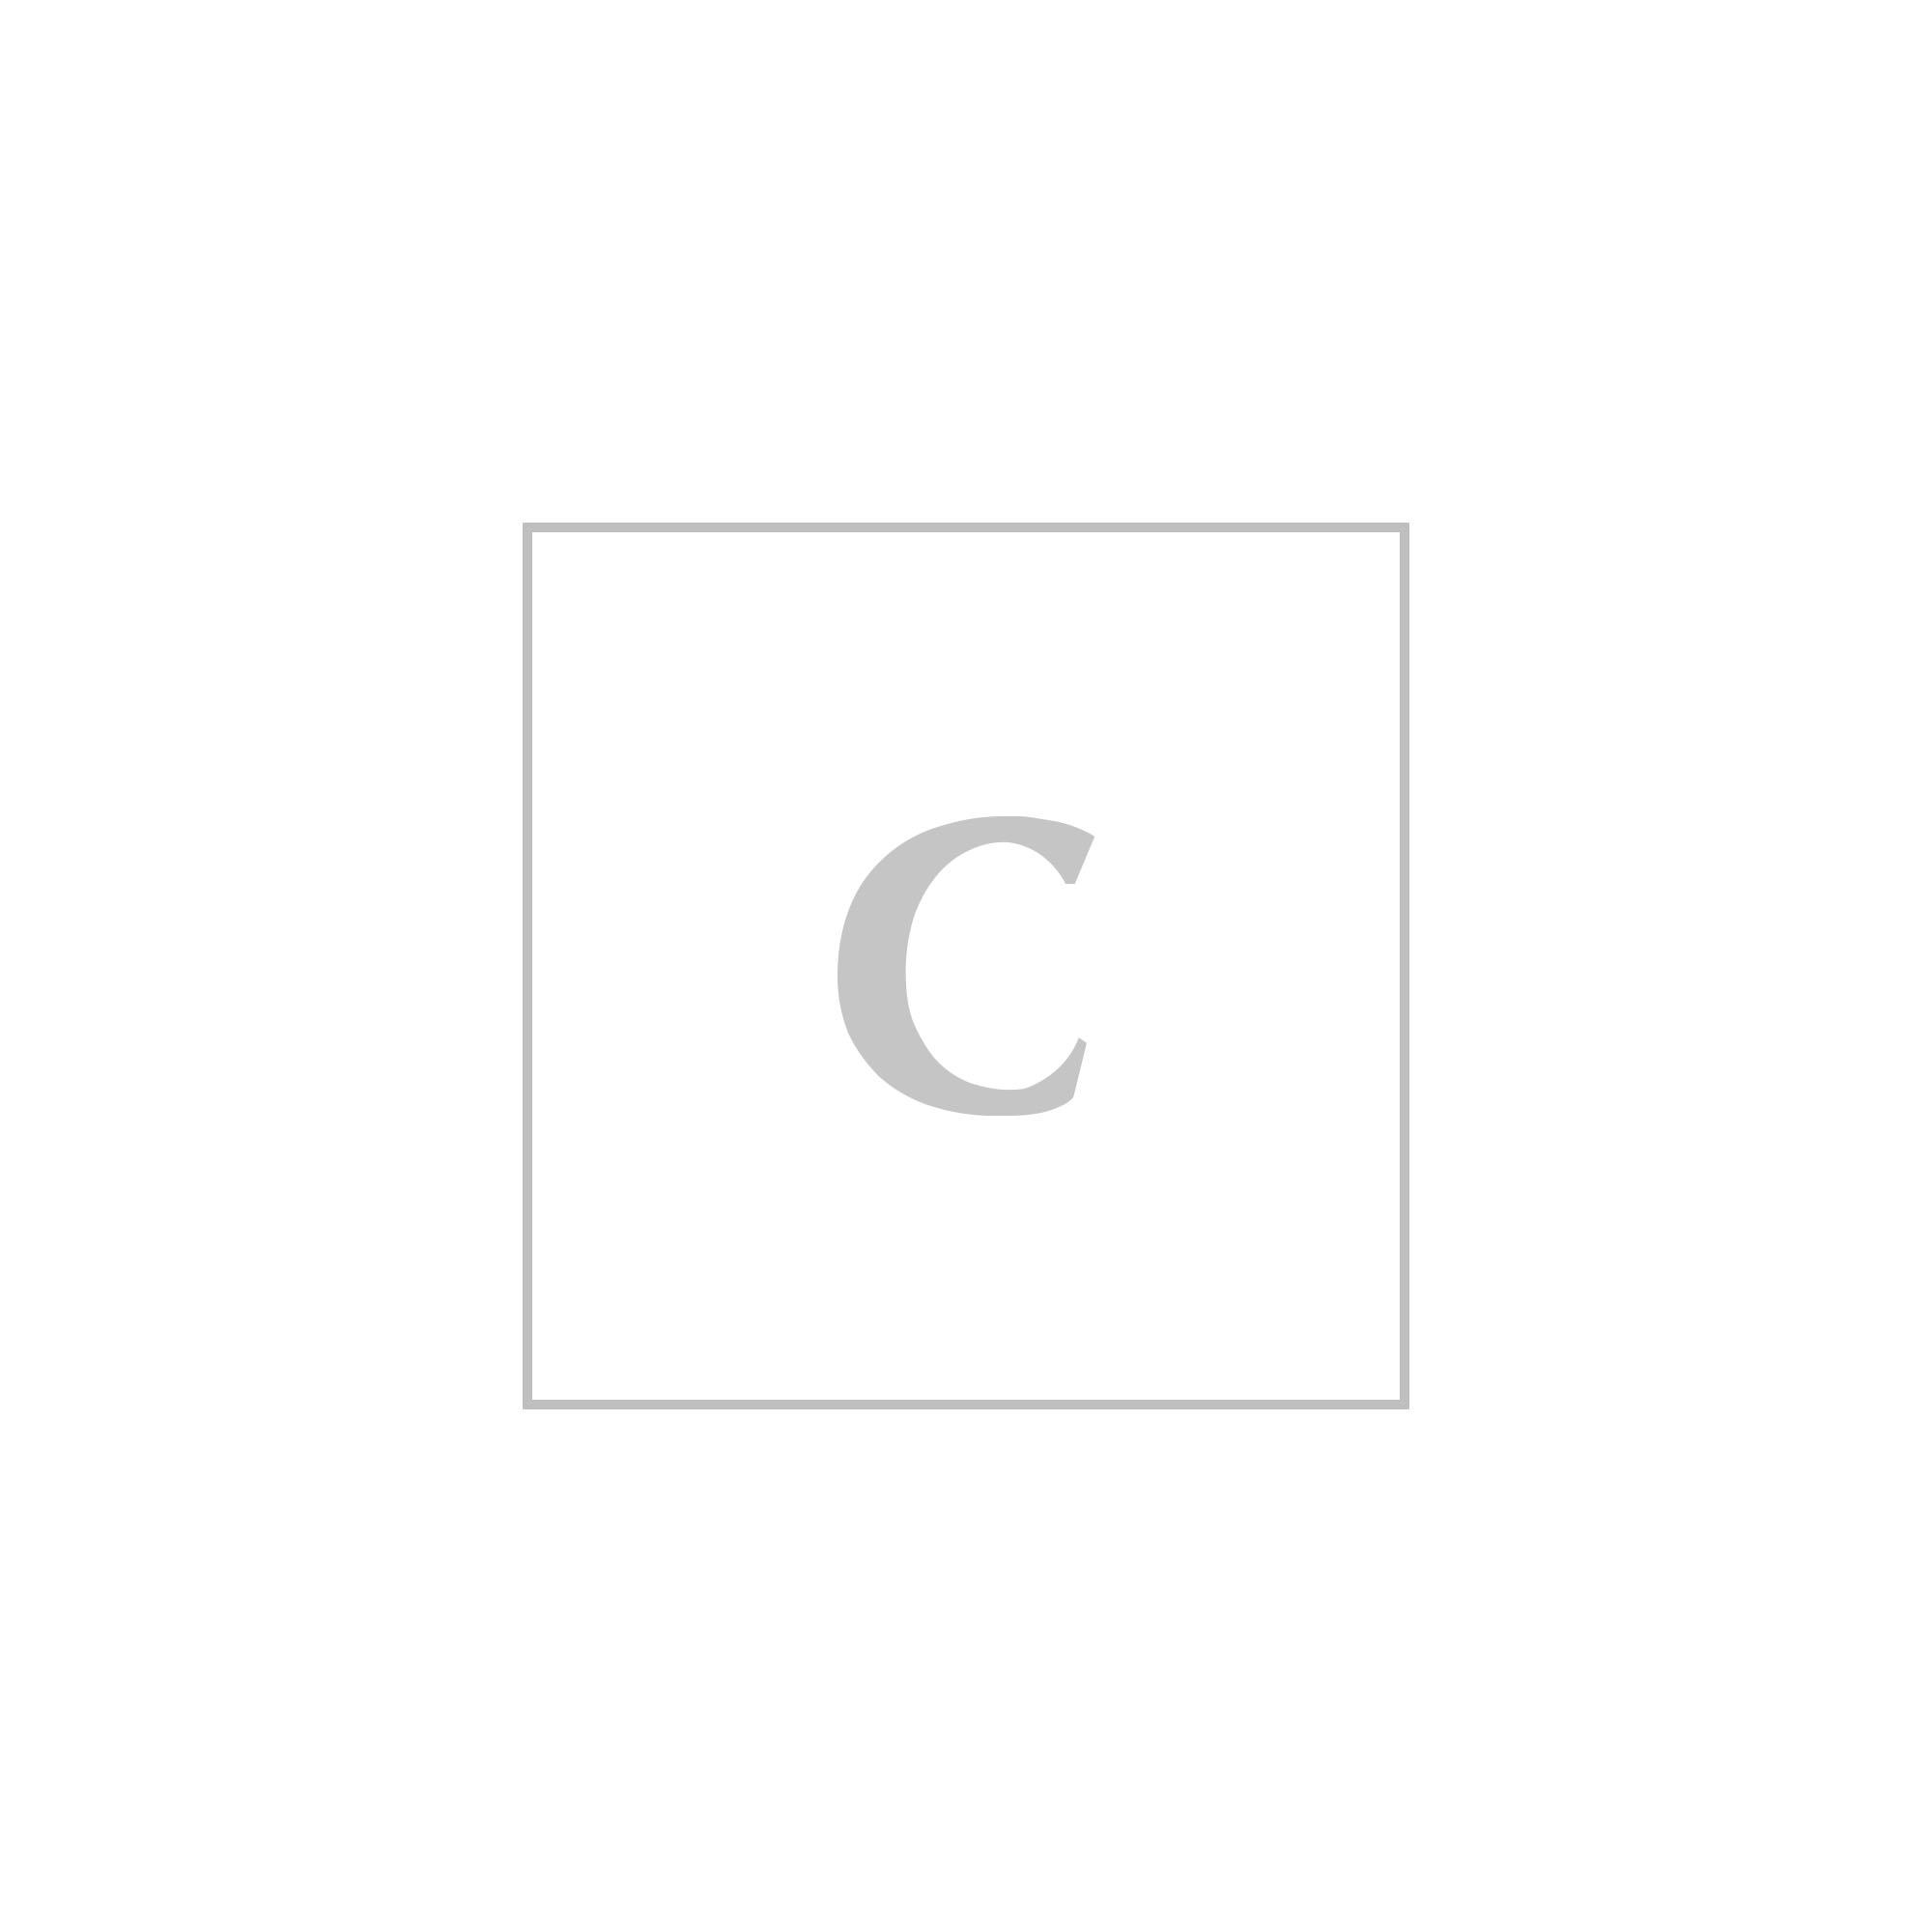 Michael kors crystal crossbody mini ava bag